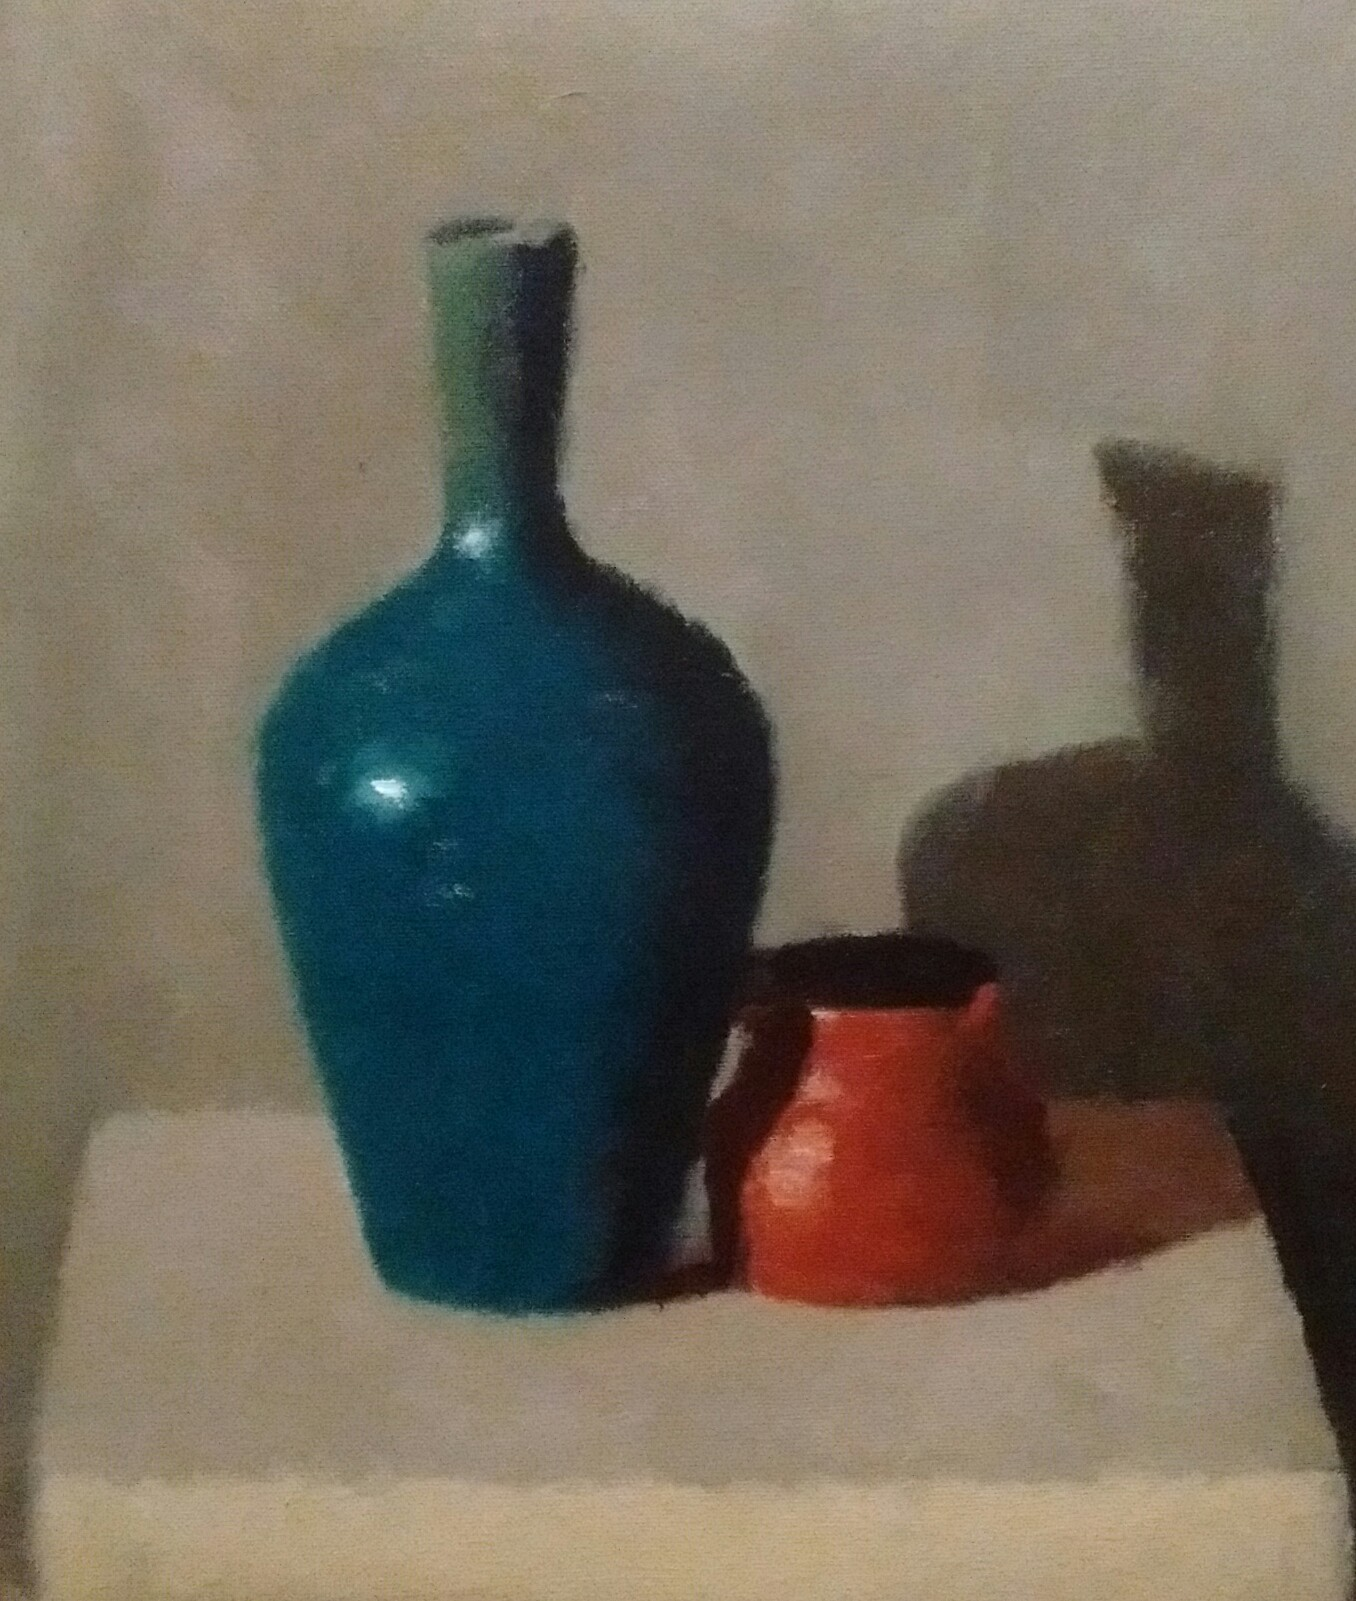 Blue Vase and Orange Jug